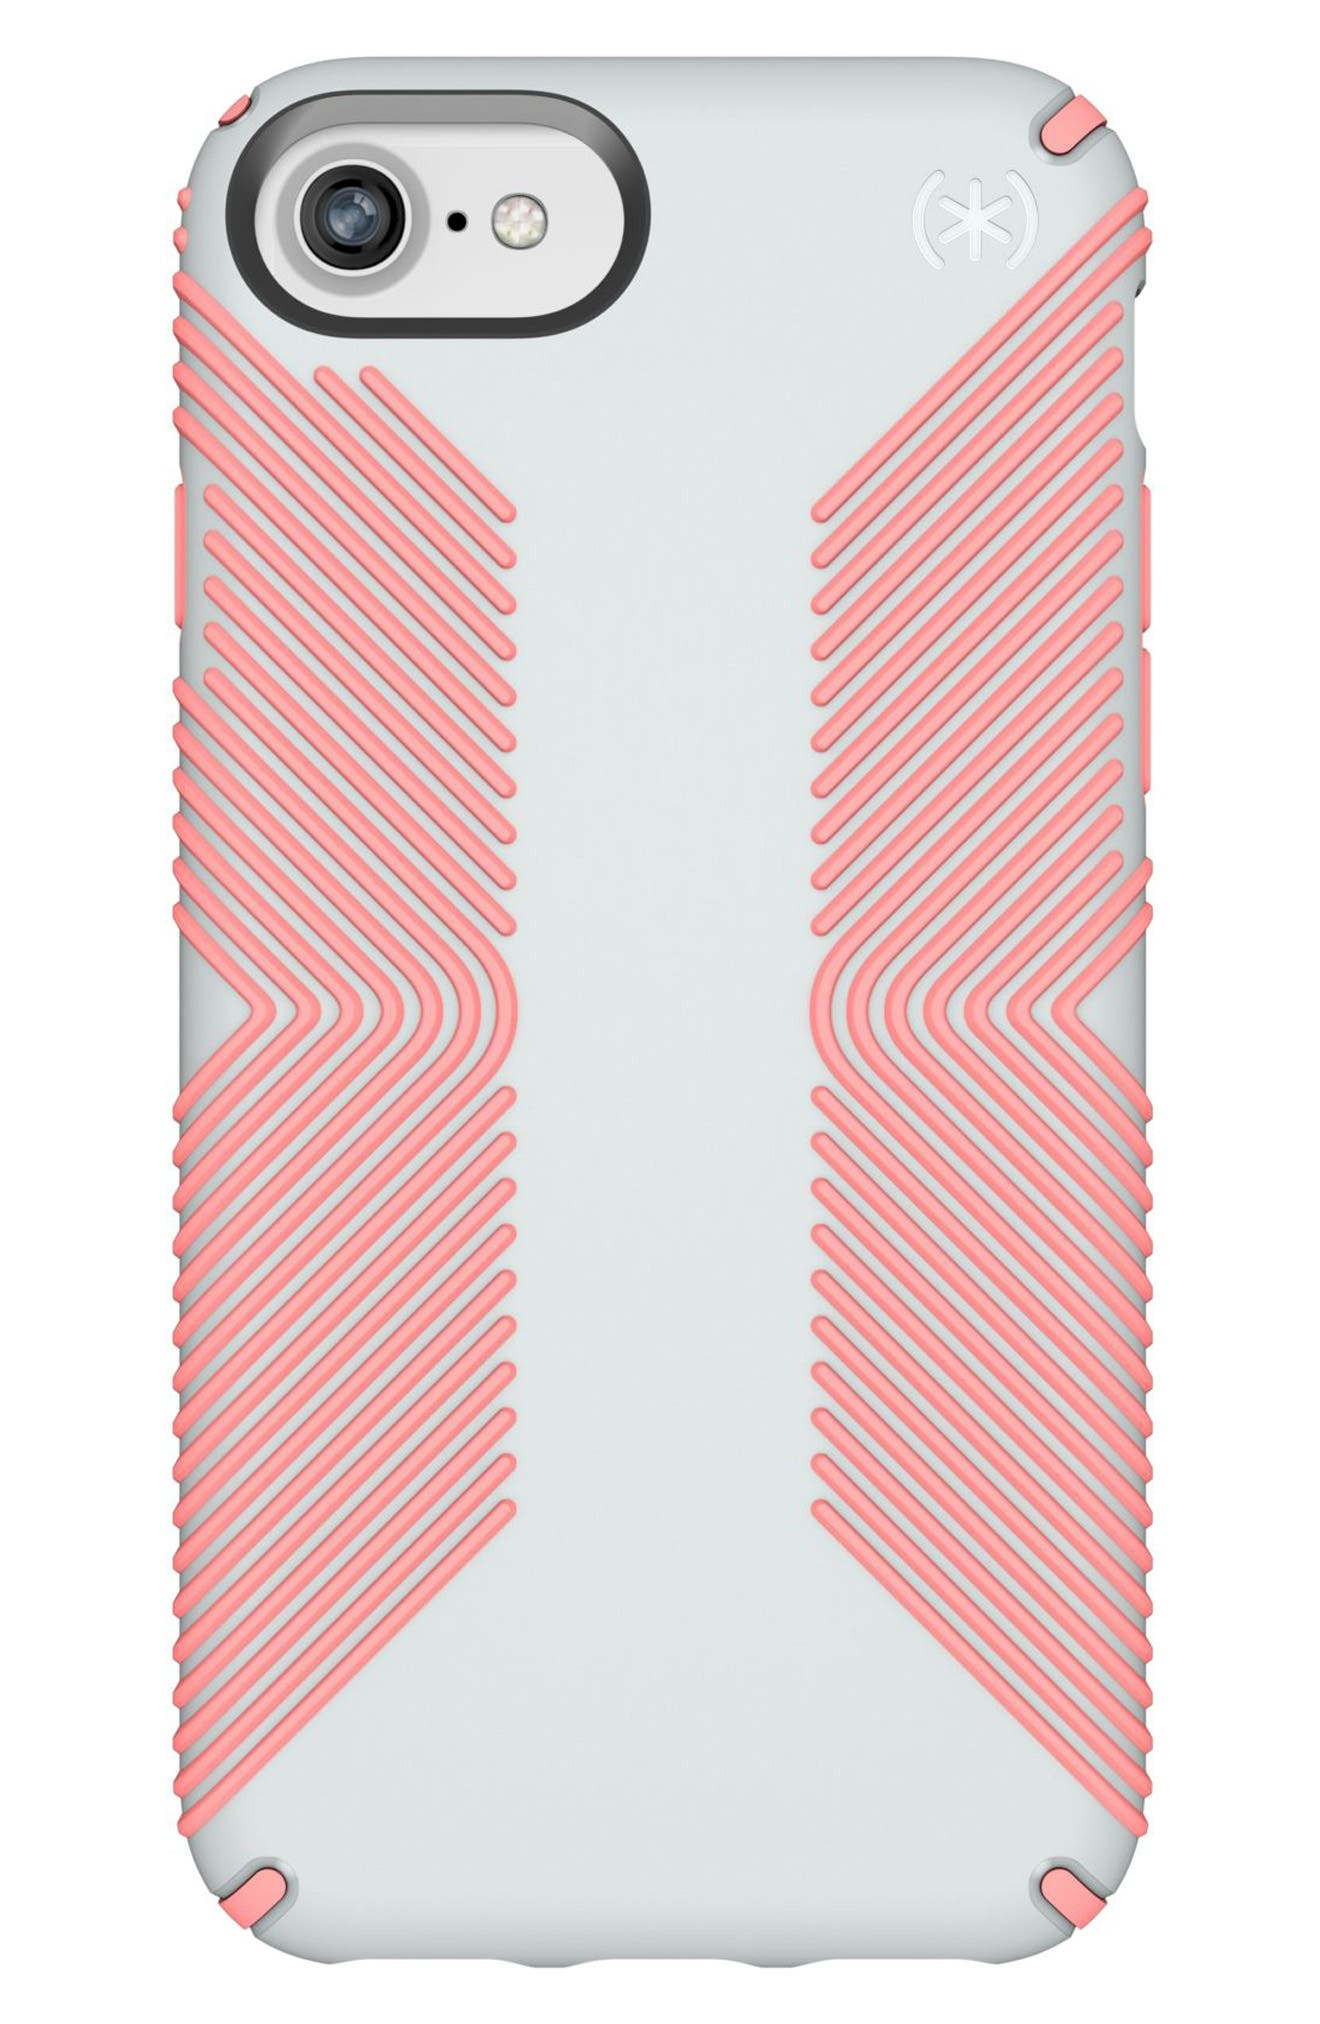 Grip iPhone 6/6s/7/8 Case,                         Main,                         color, Dove Grey/ Tart Pink